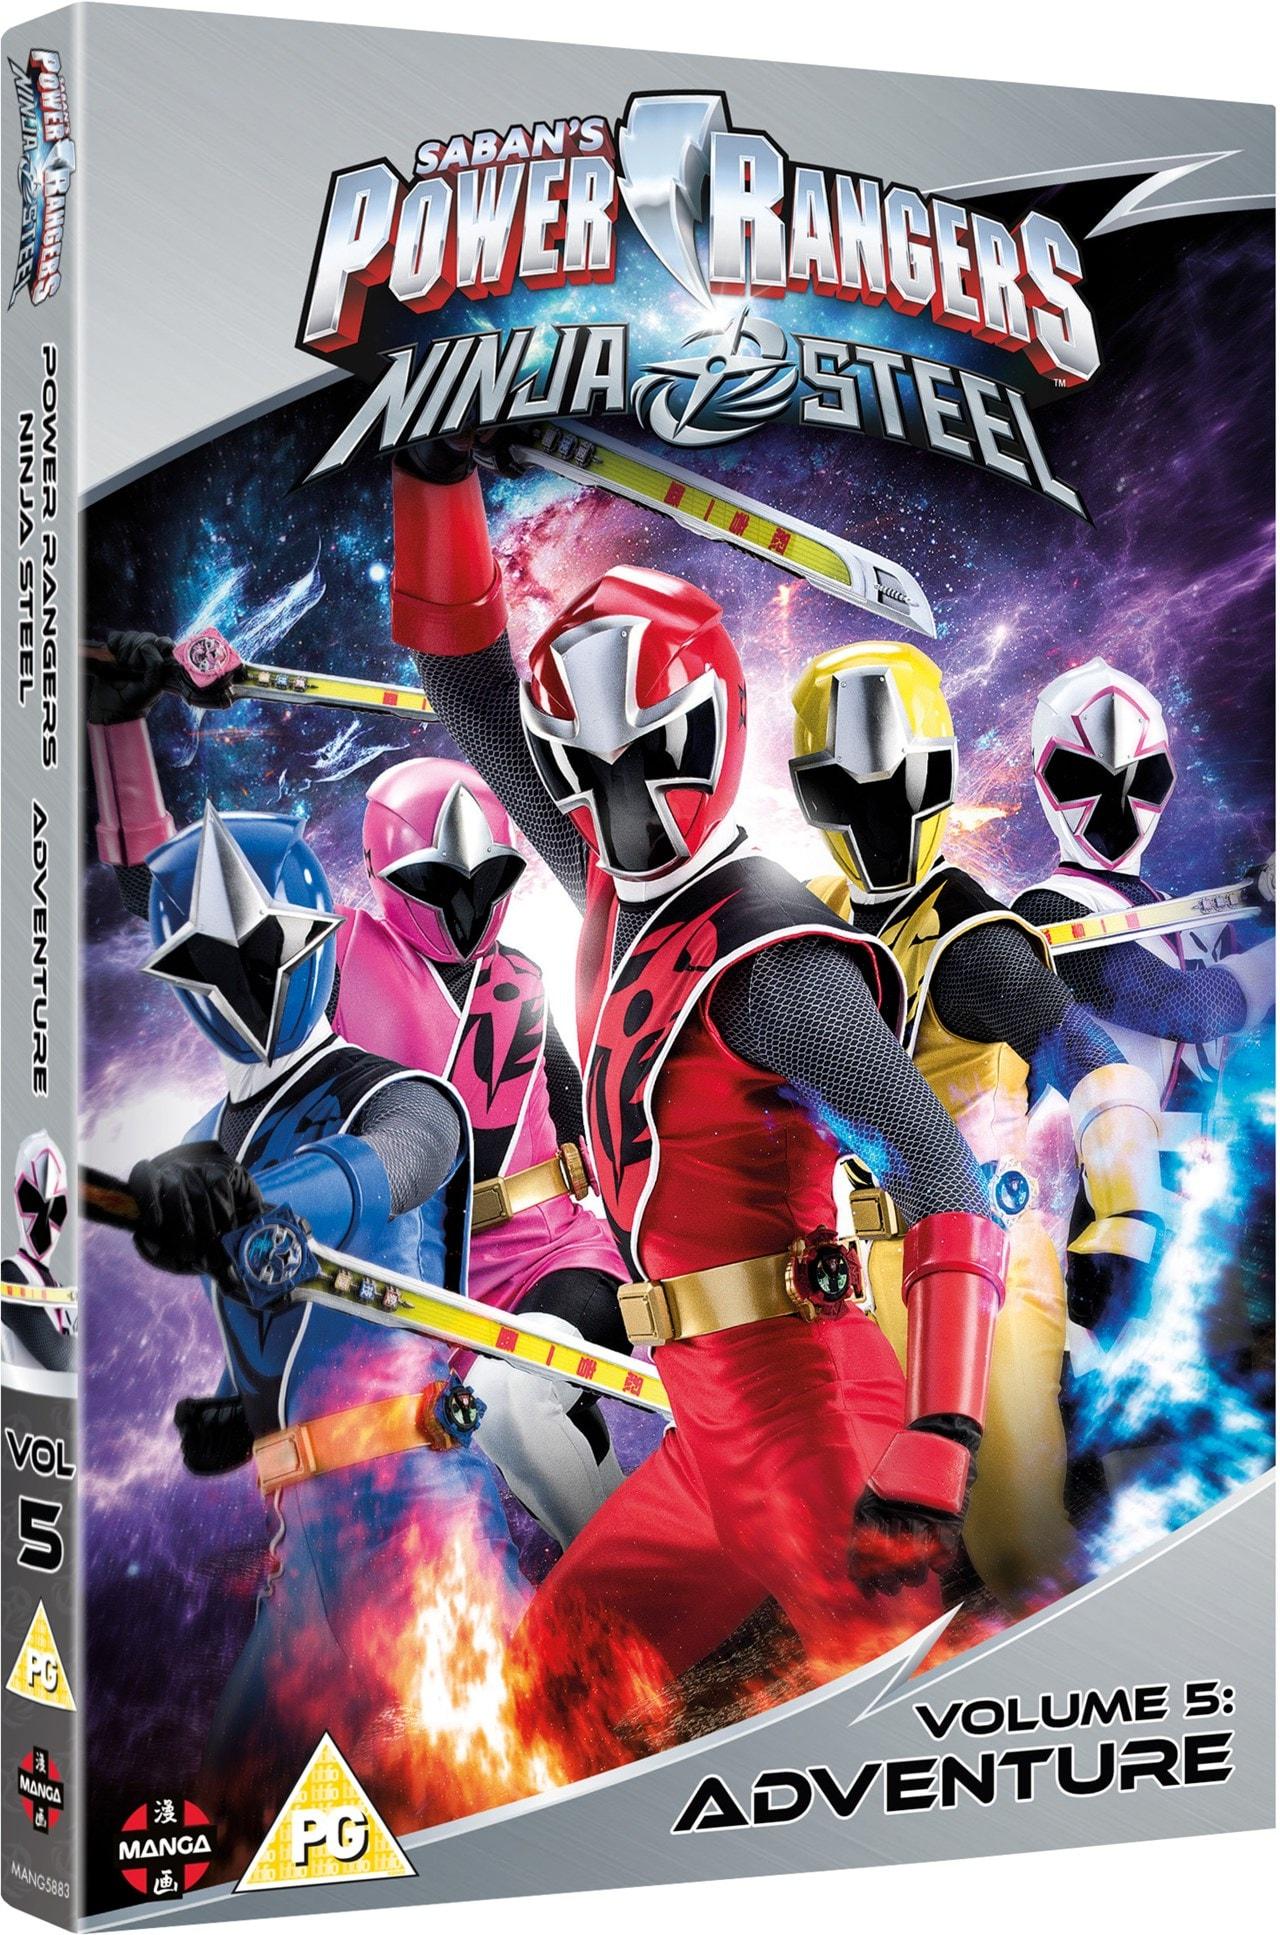 Power Rangers Ninja Steel: Volume 5 - Adventure - 2